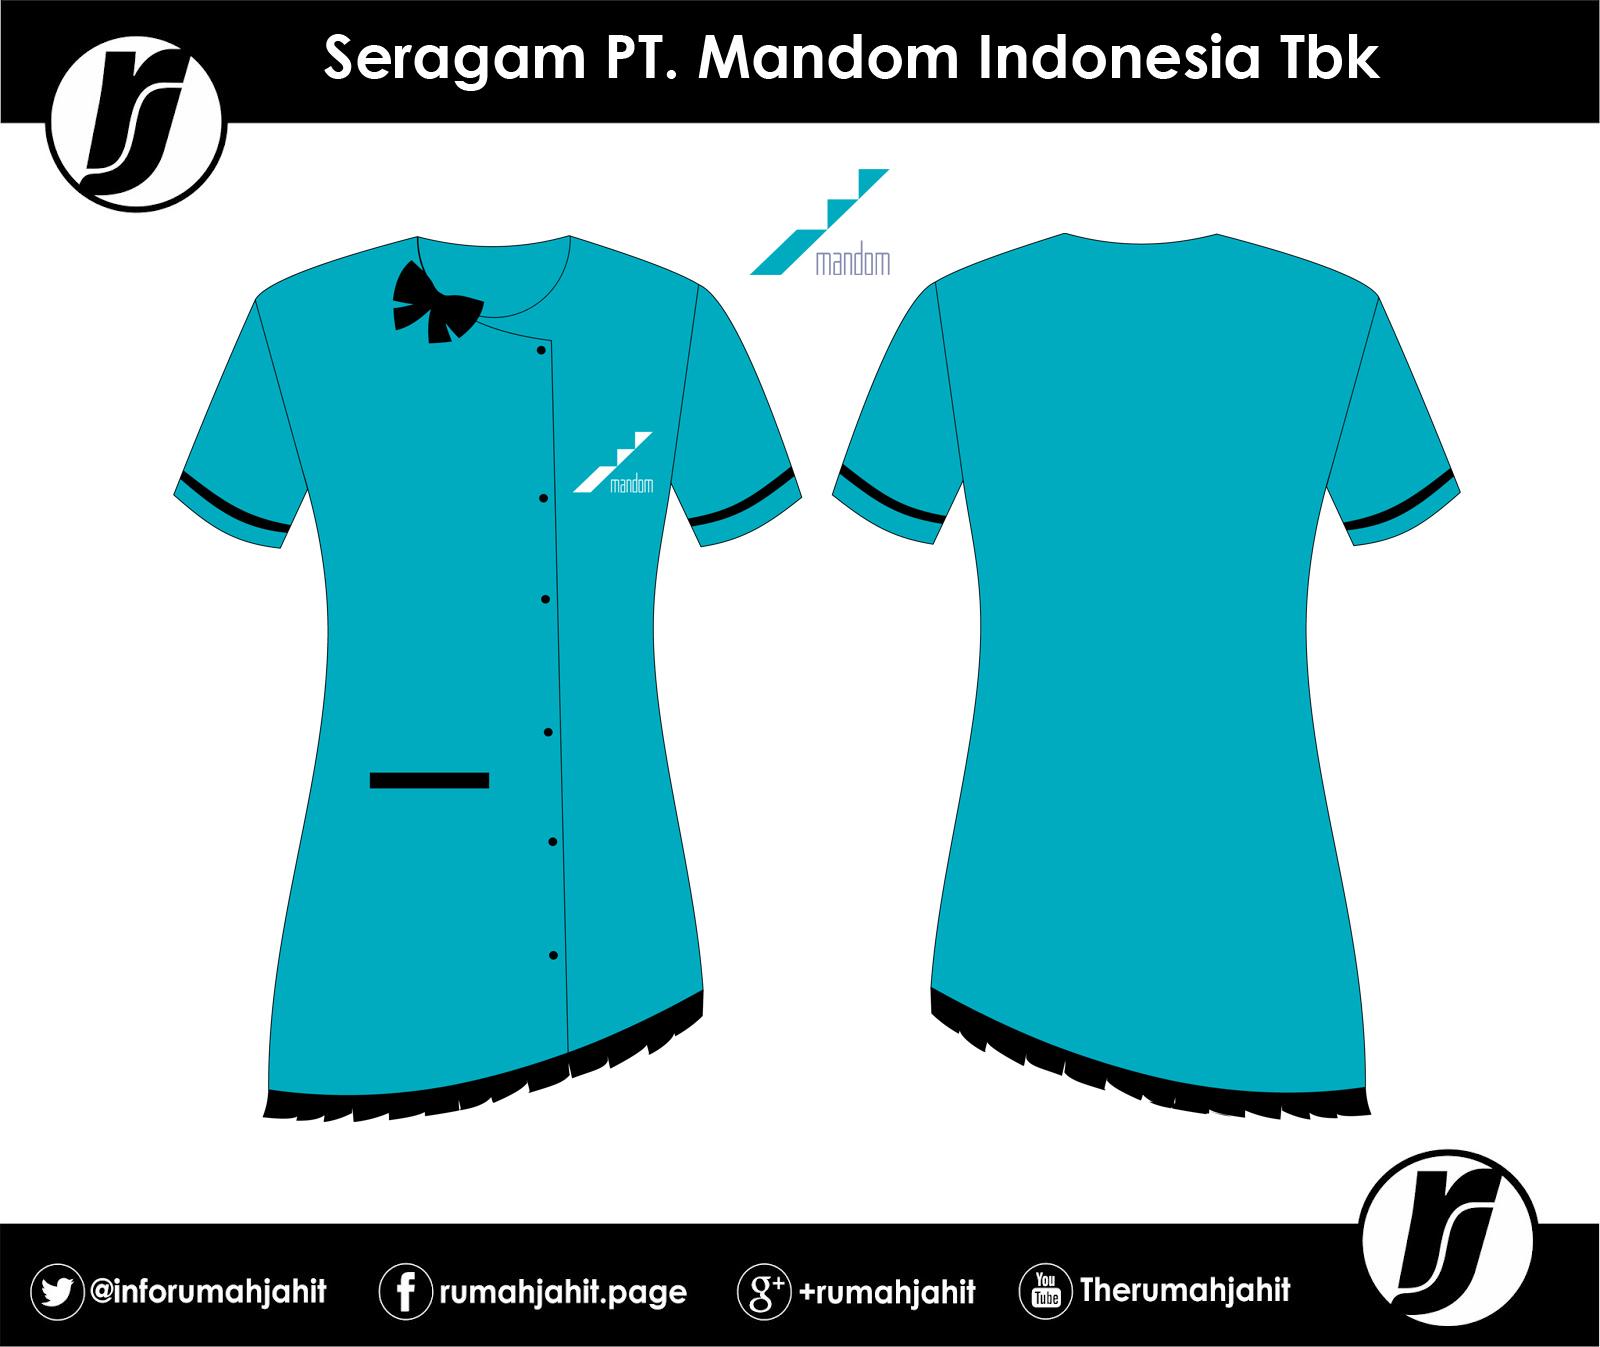 Kemeja PT. Mandom Indonesia Tbk - Mitra Pengadaan Seragam No 1 di ... e21578b467